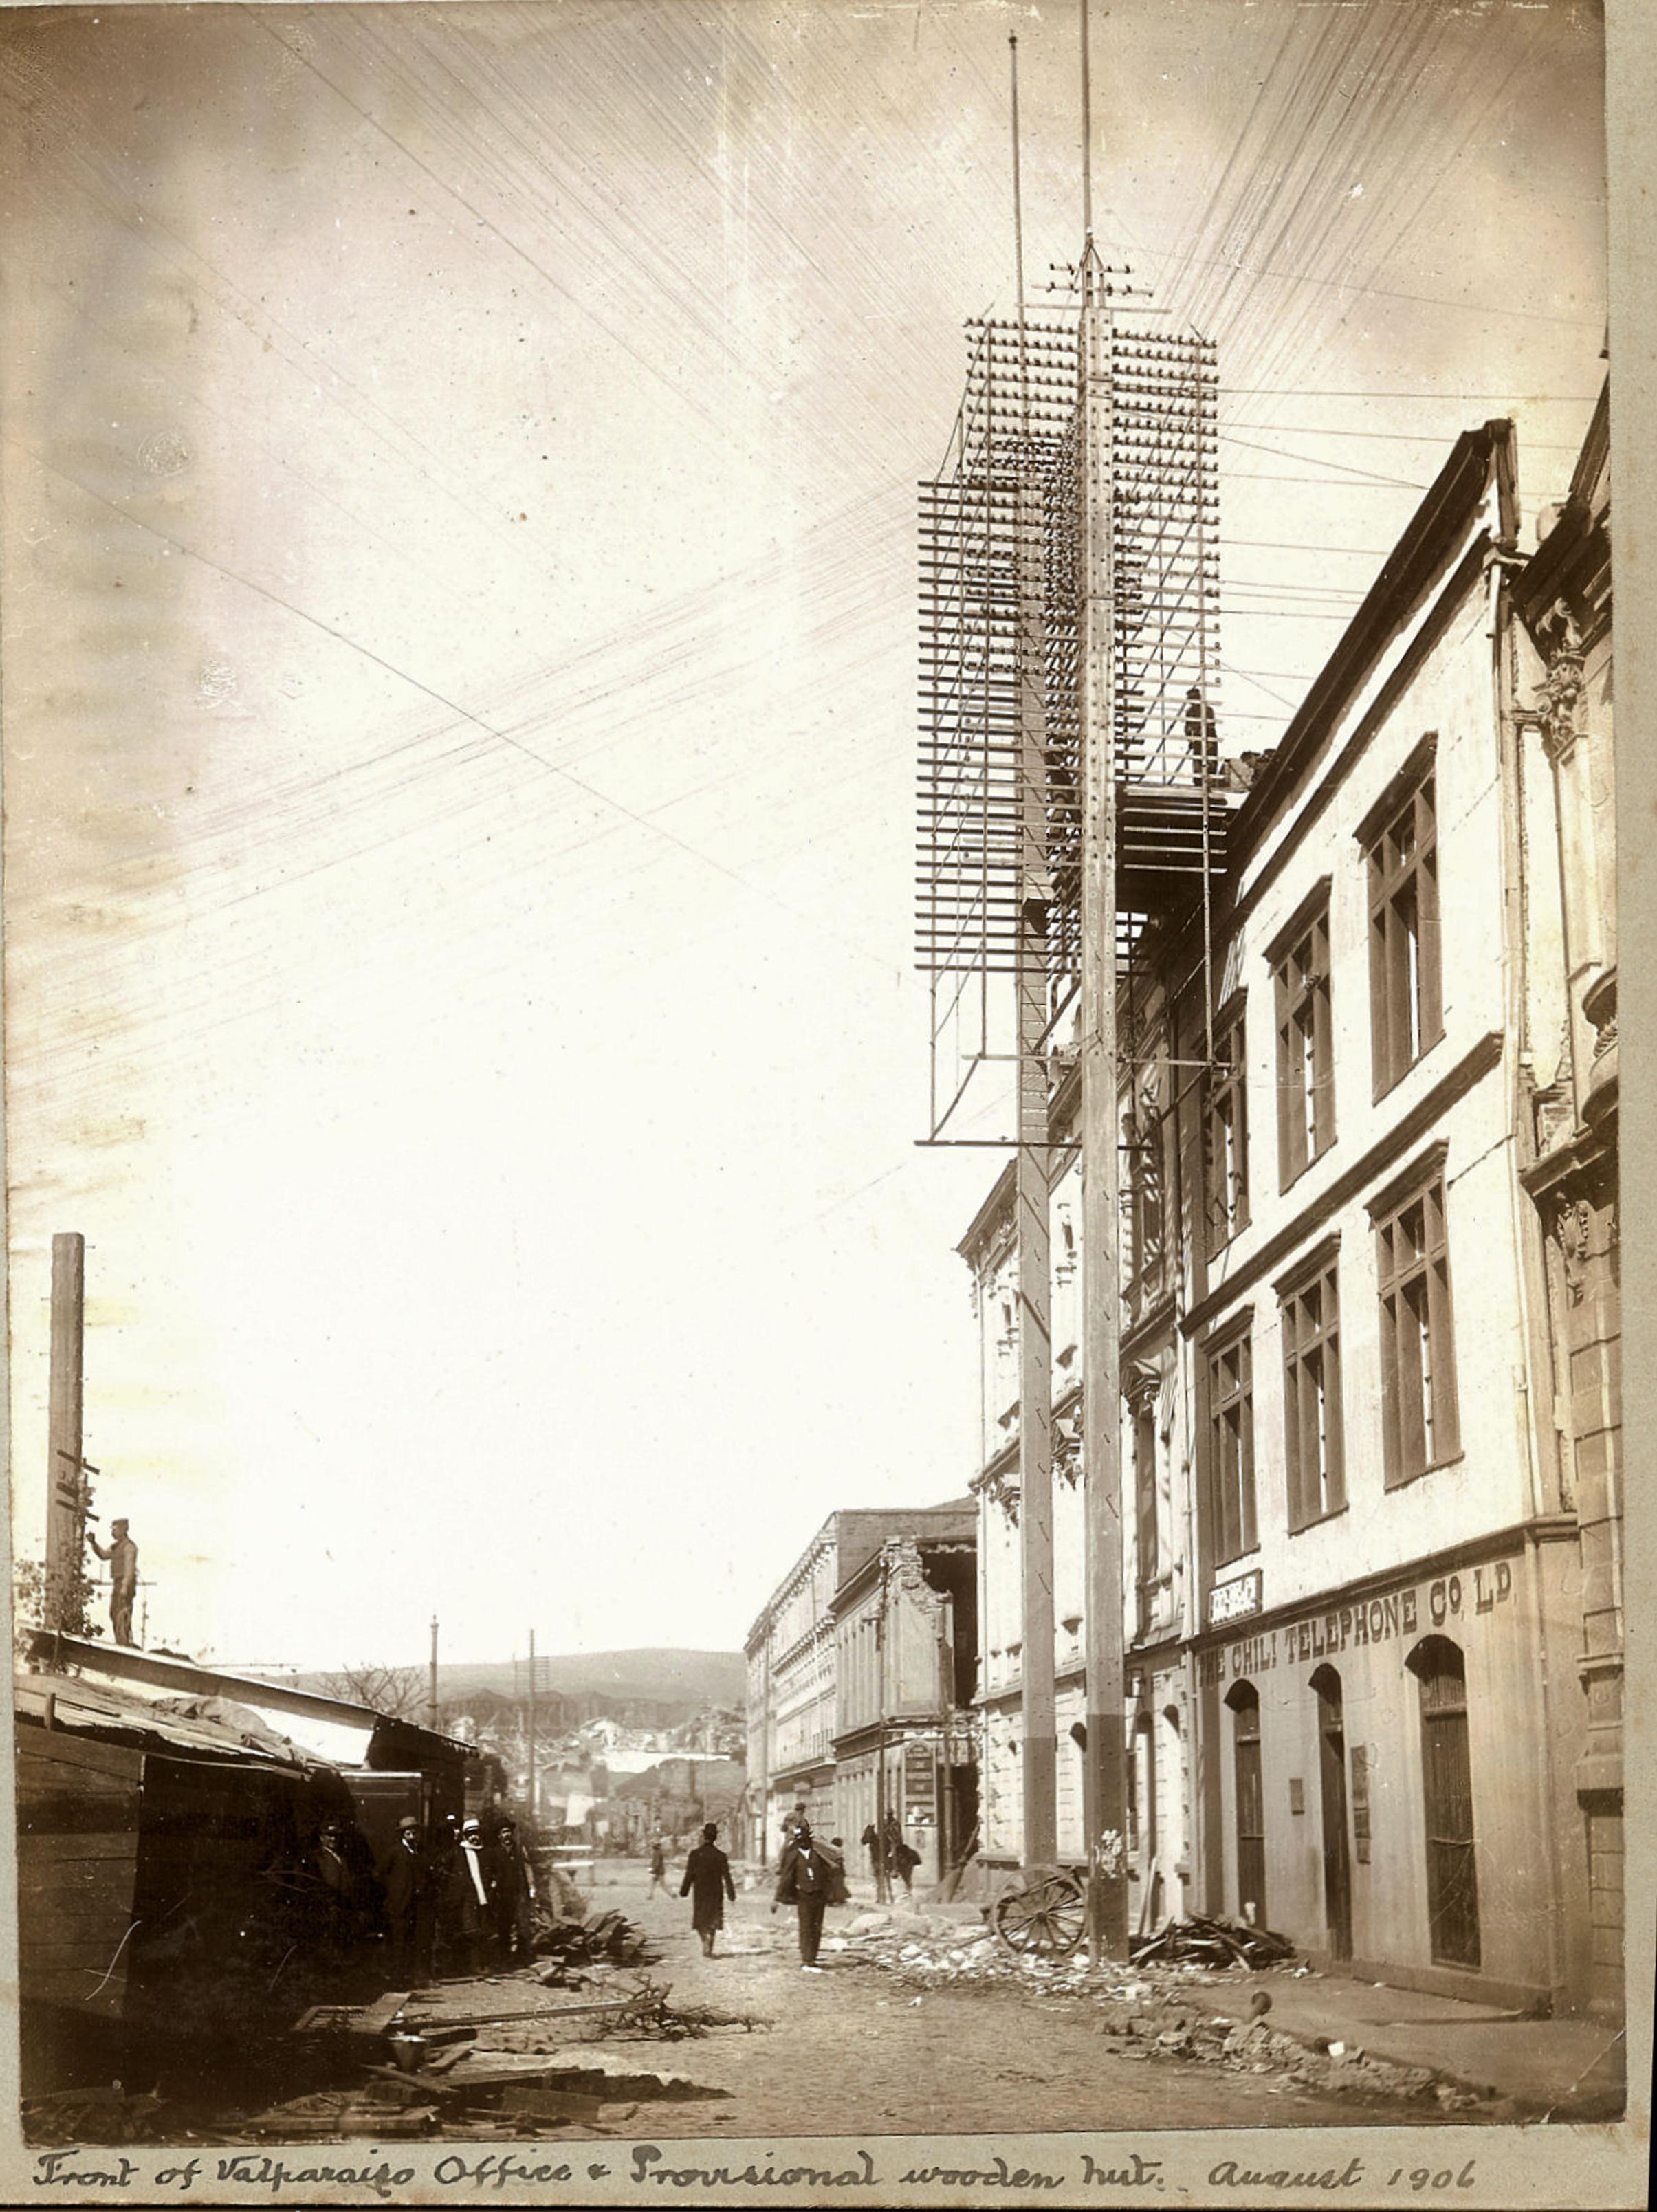 Enterreno - Fotos históricas de chile - fotos antiguas de Chile - Valparaíso en 1906